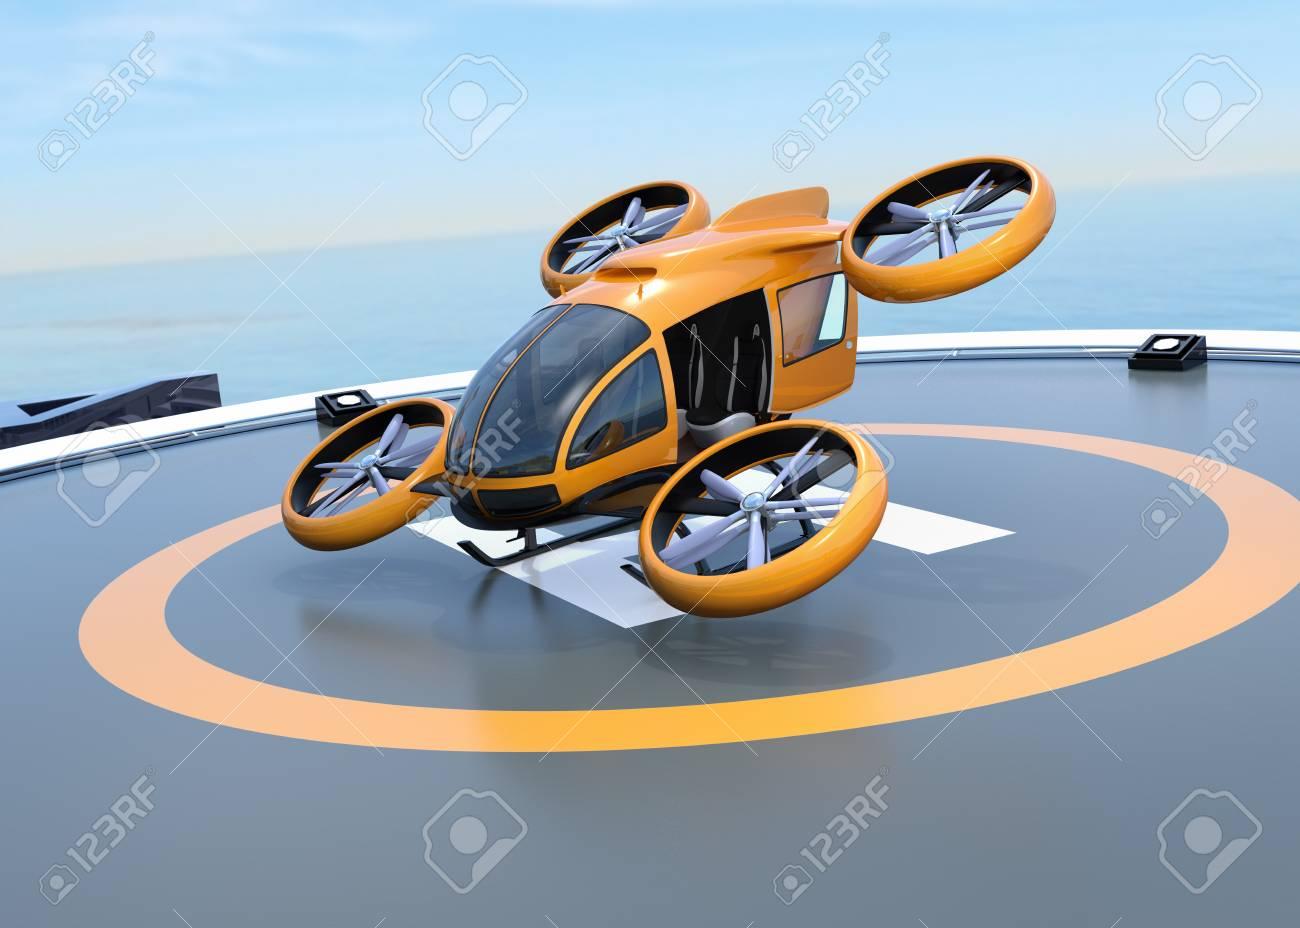 Orange self-driving passenger drone takeoff from helipad. 3D rendering image. - 99049809